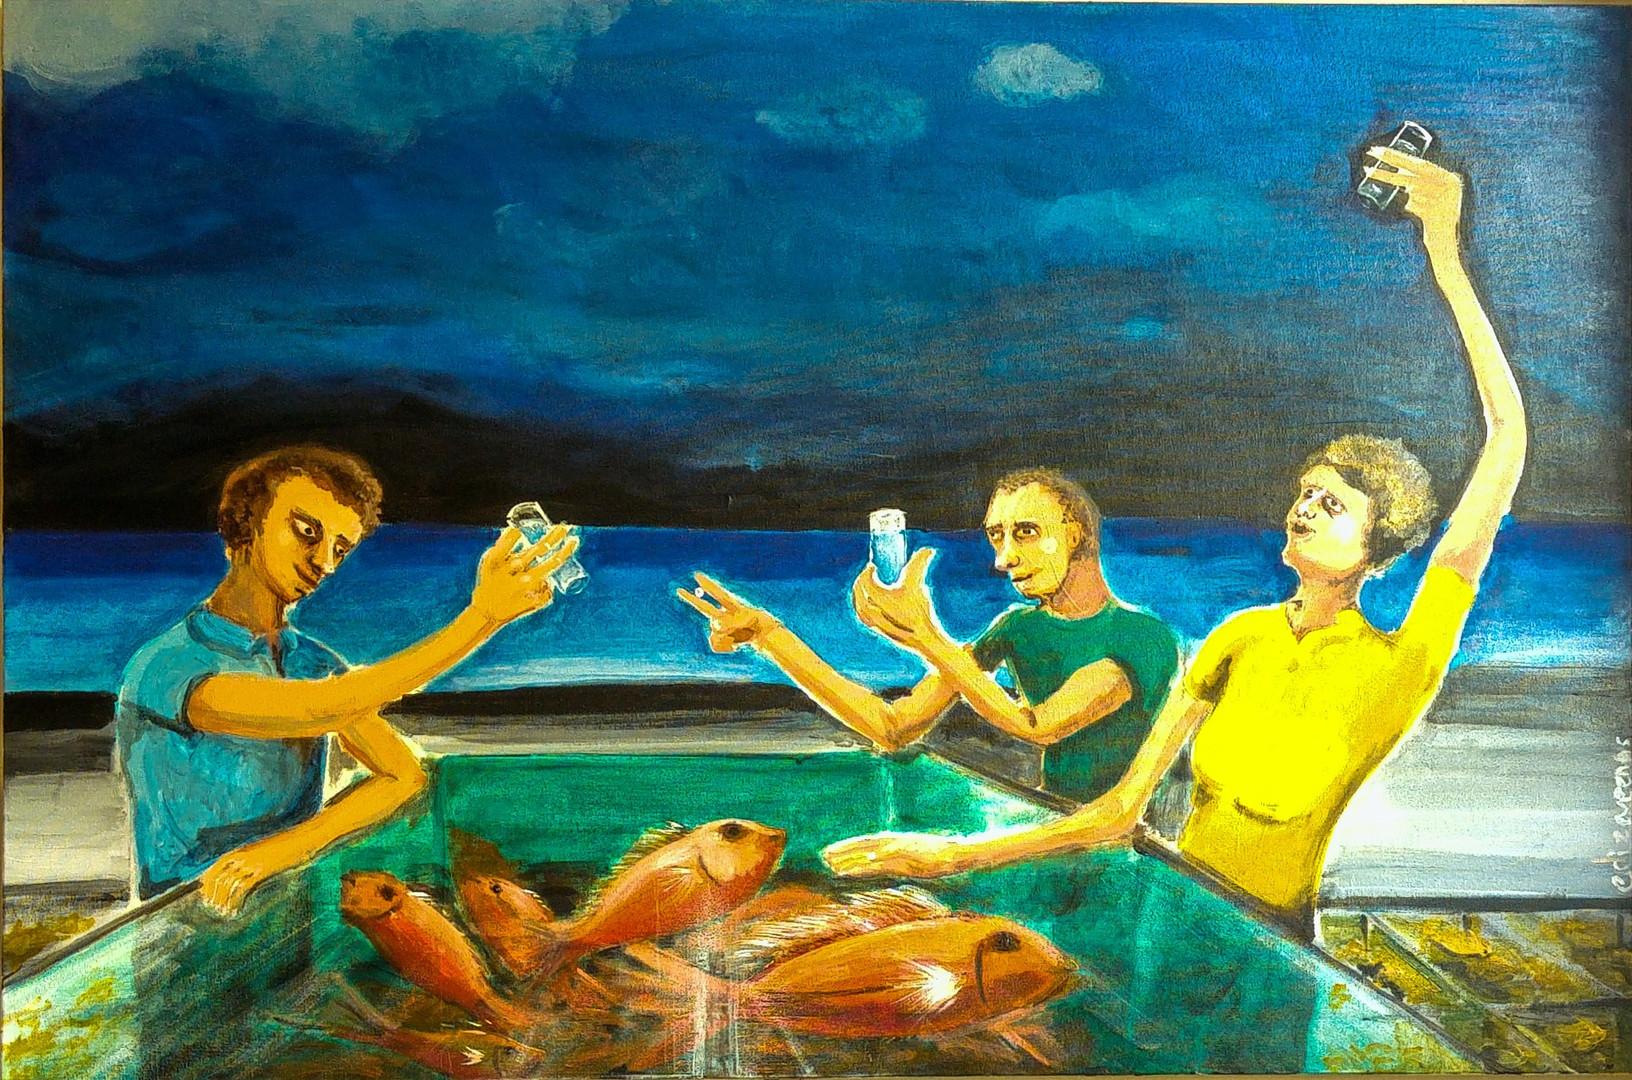 acrylic on canvas 24 x 36 inch